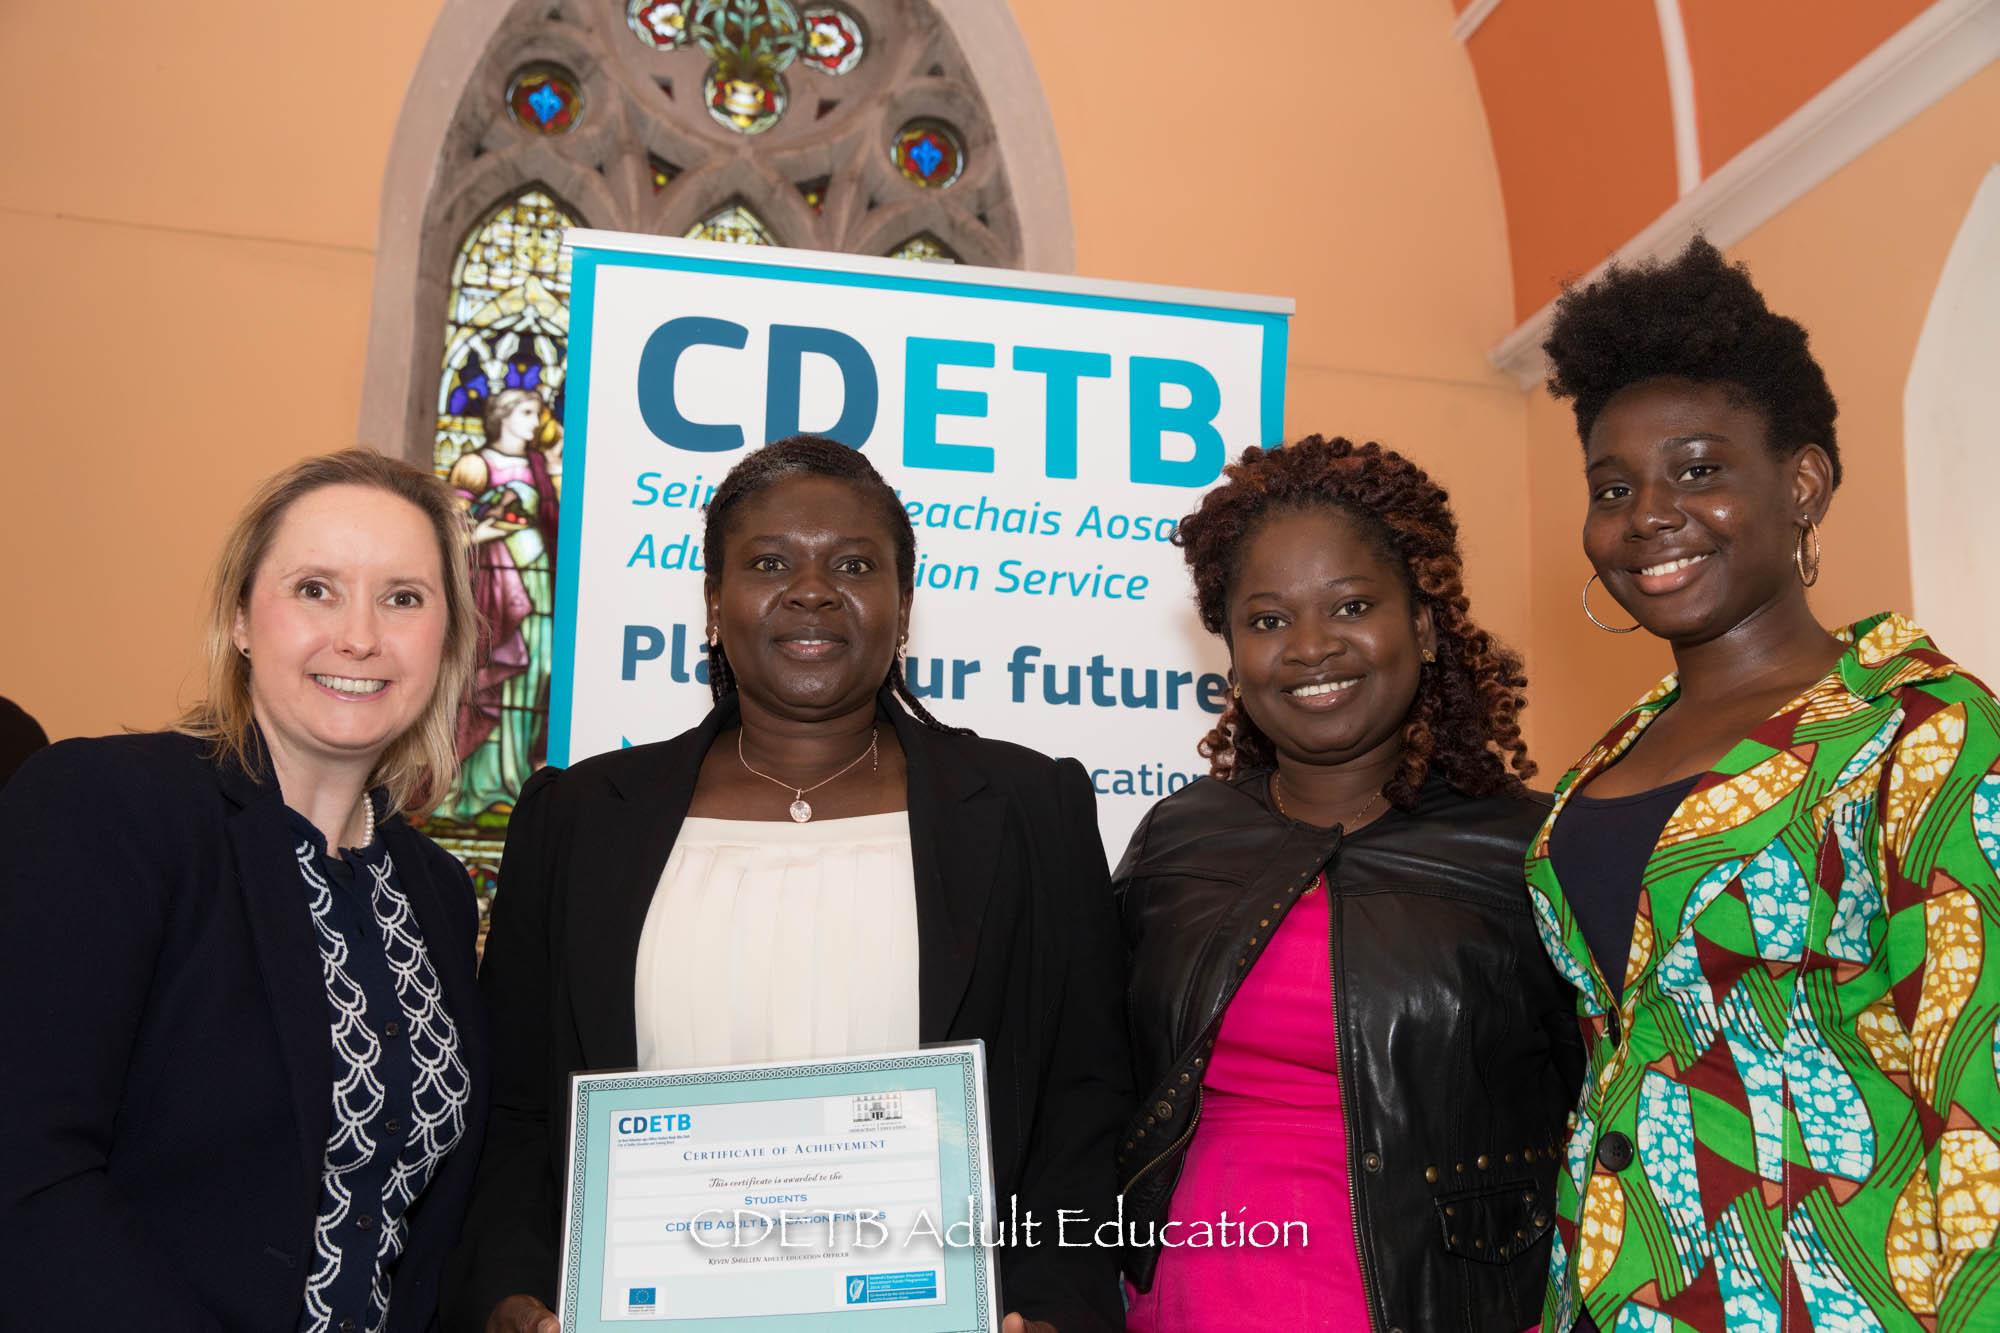 CDETB Adult Education-3.jpg